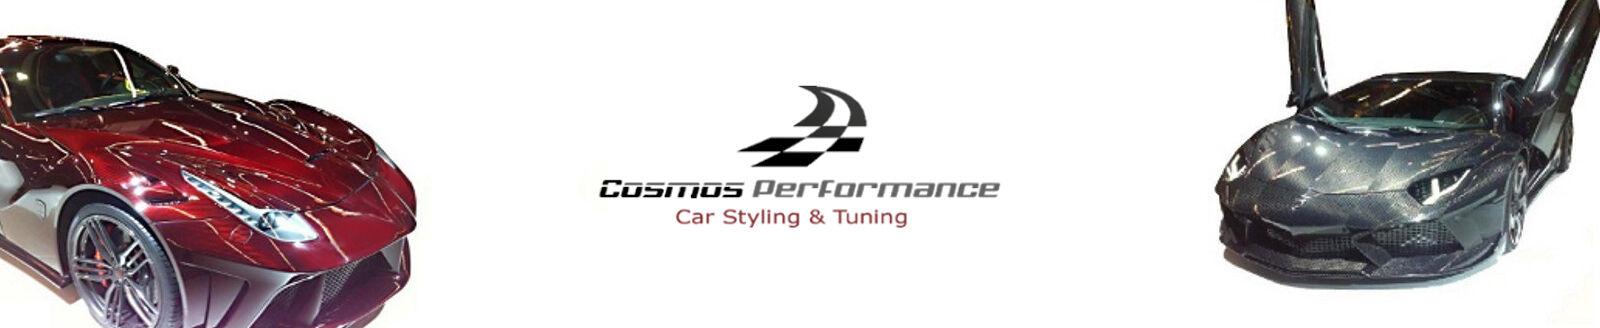 COSMOS Performance